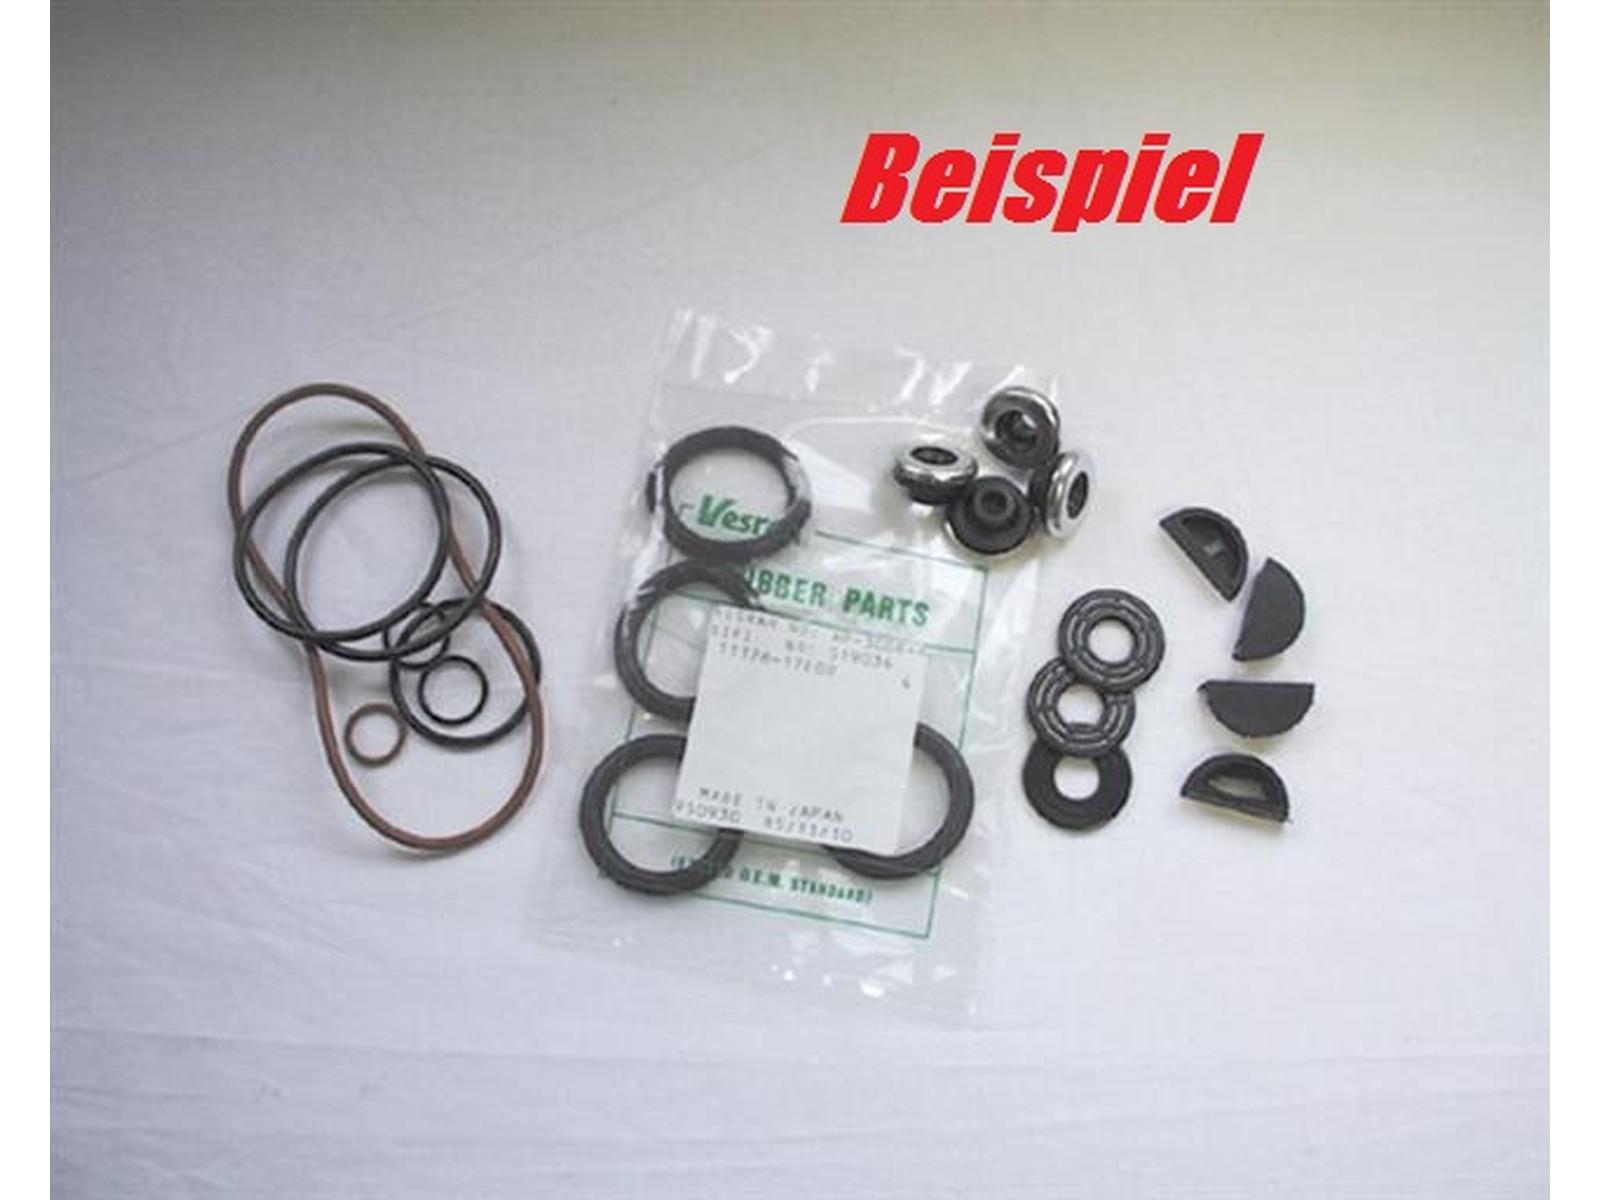 Ventildeckeldichtung Kawasaki Z 650 F / Z 750 E